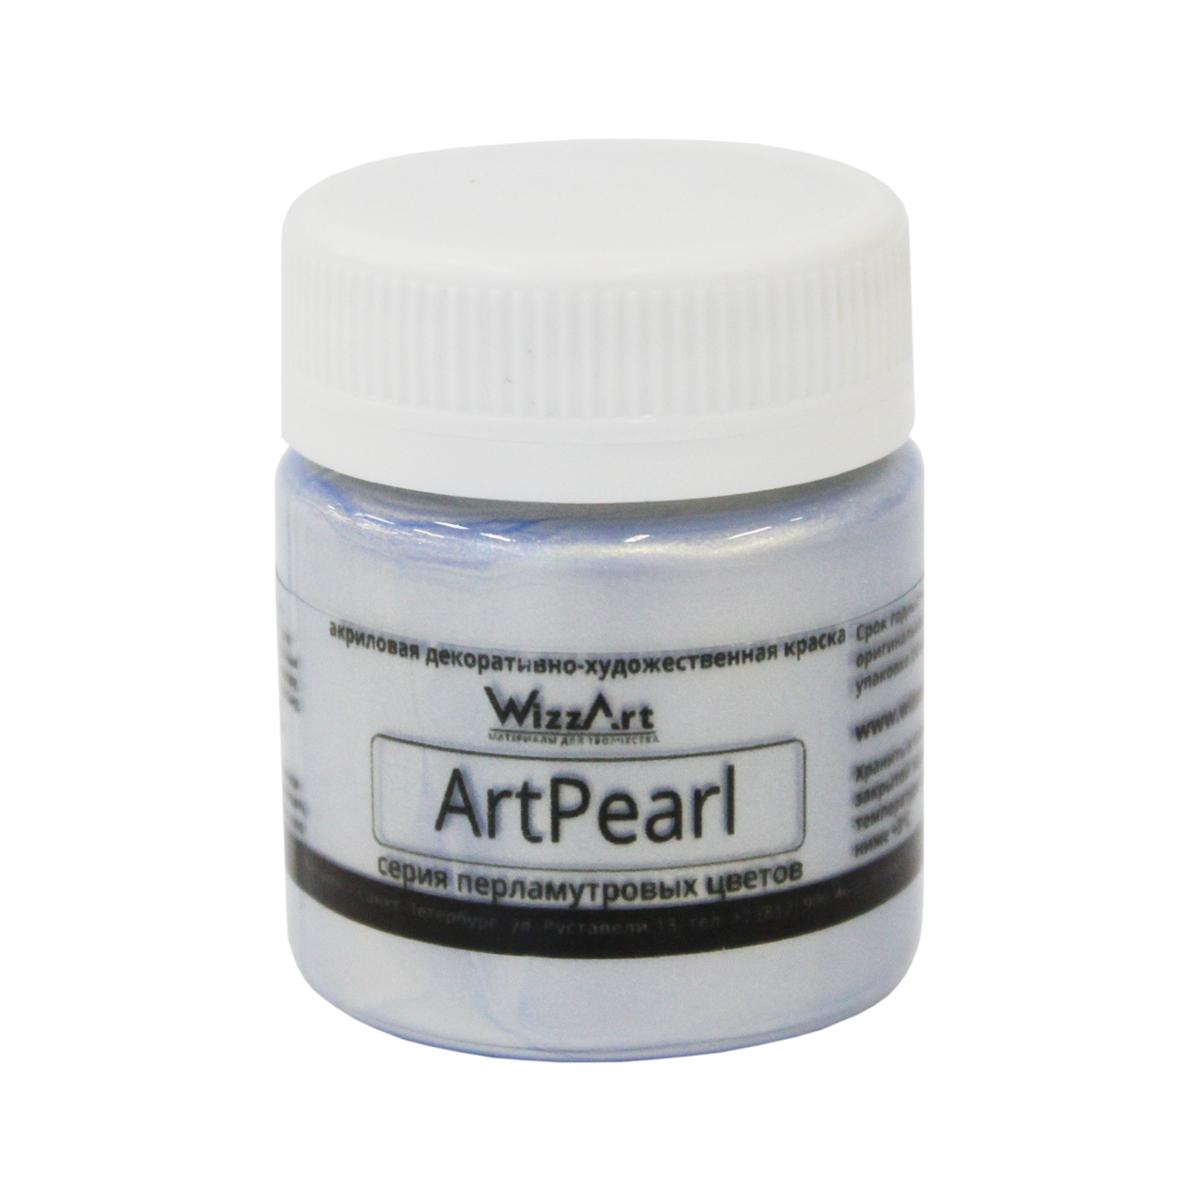 Краска акриловая Wizzart ArtPearl. Хамелеон, цвет: ультрамарин, 40 мл501051